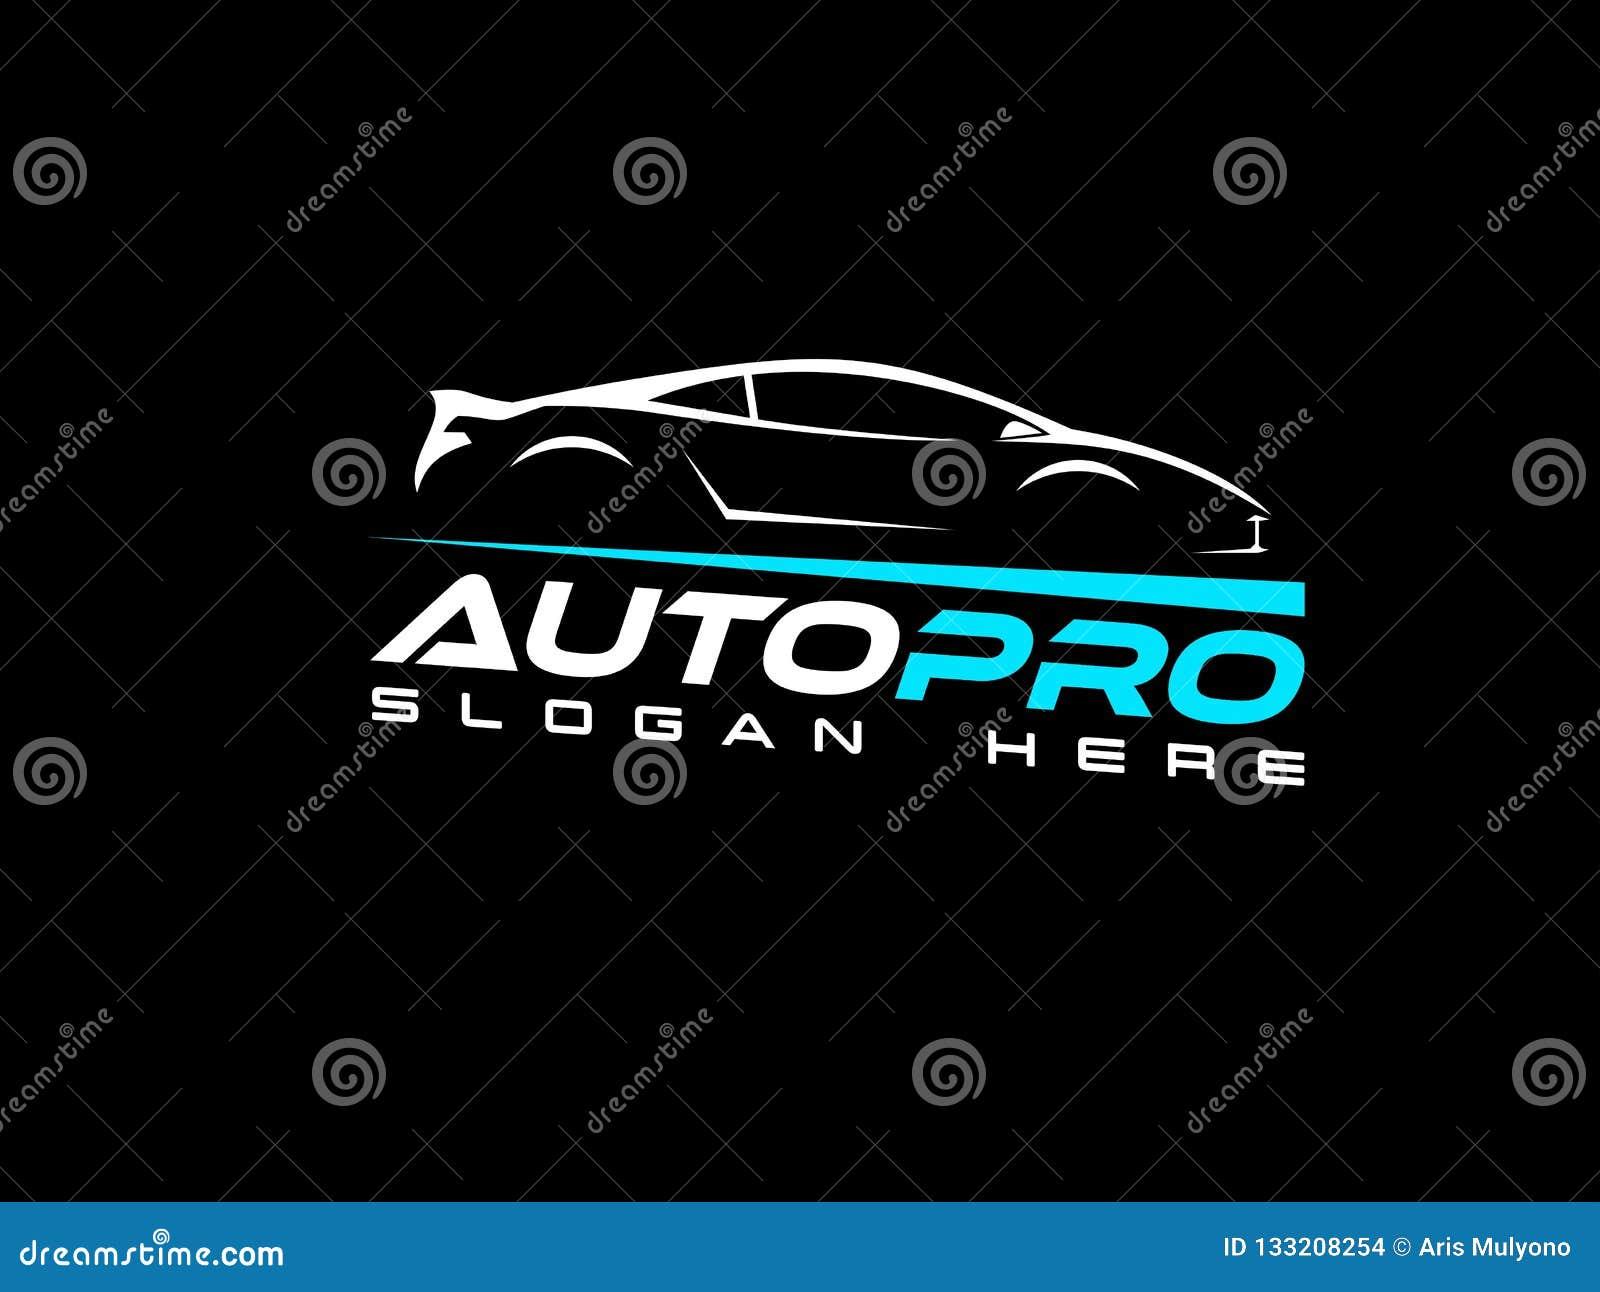 Modern Car Logo Design Inspiration Stock Illustration Illustration Of Auto Automotive 133208254